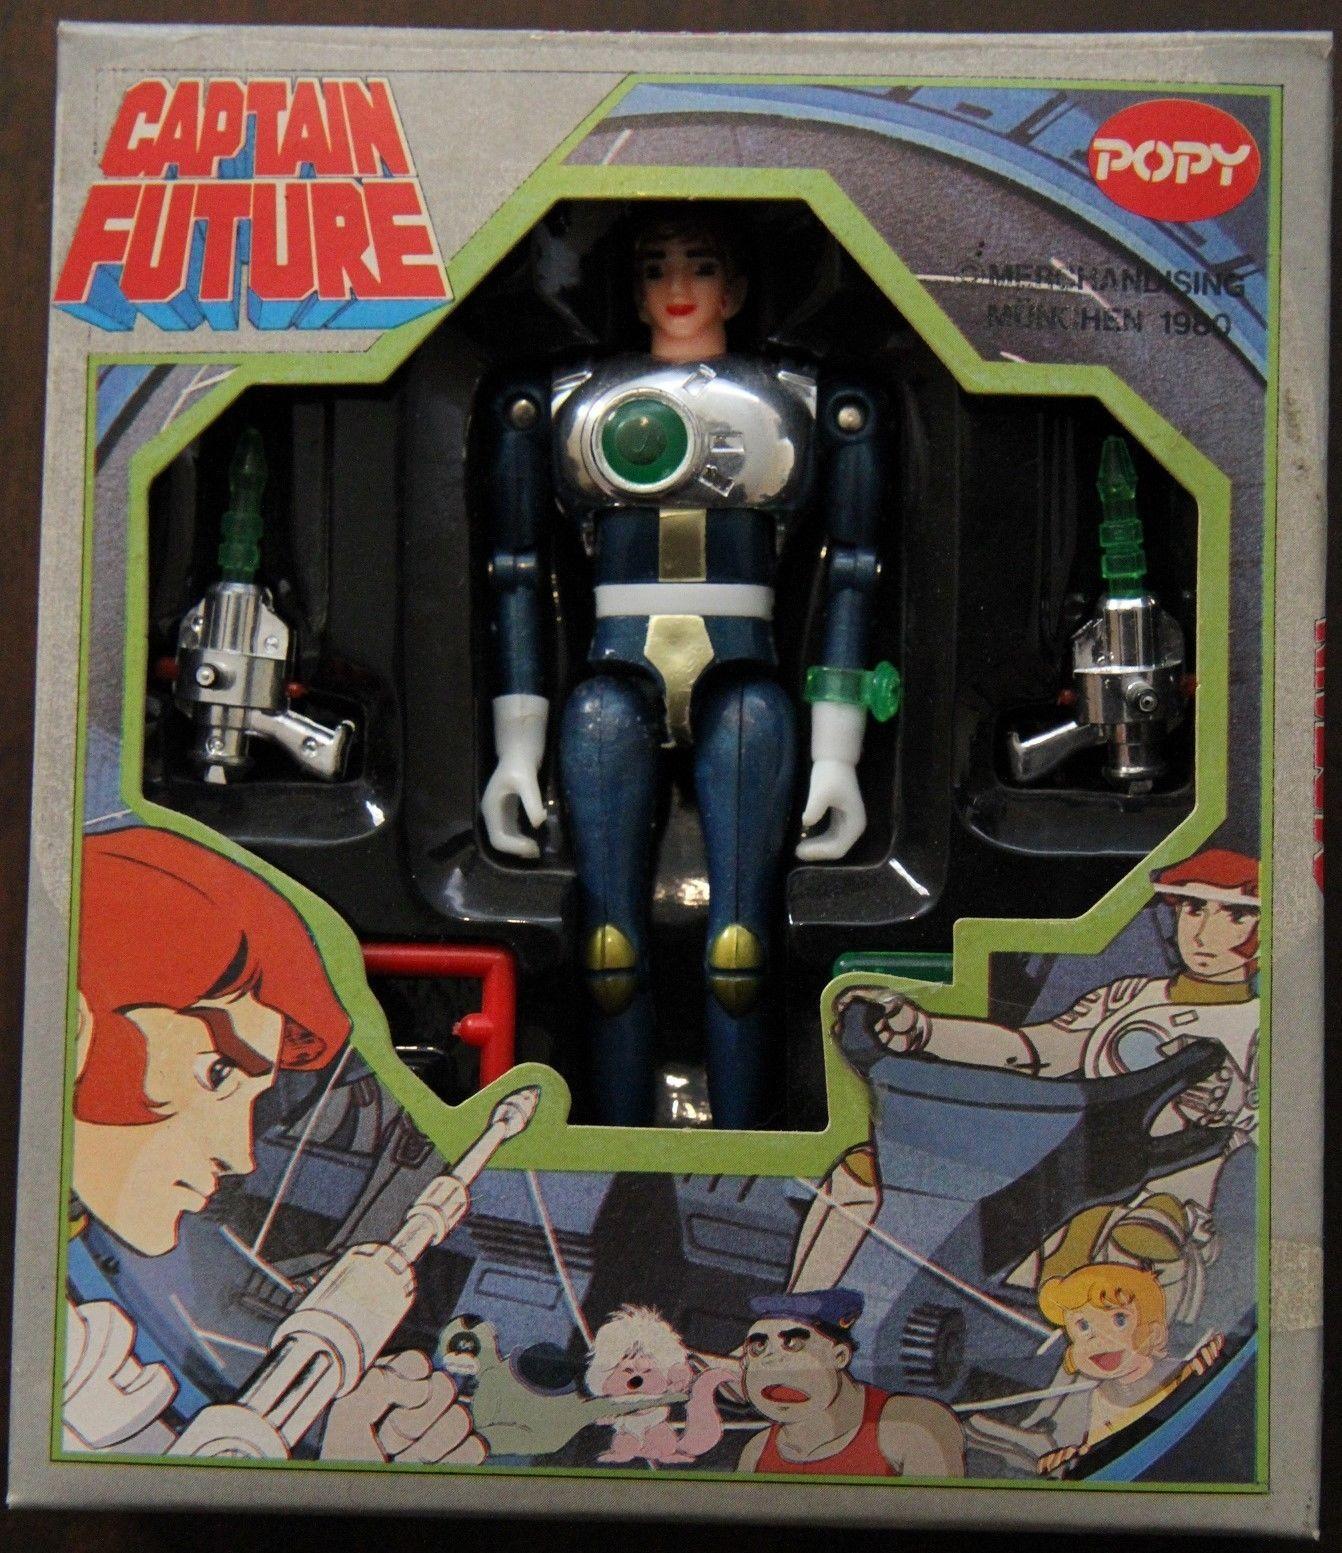 Figurine Capitaine Flam Future Popy Bandai Epoque Goldorak Ulysse 31 Ebay Http Amzn To 2rvscya Capitaine Flam Goldorak Jouets Japonais